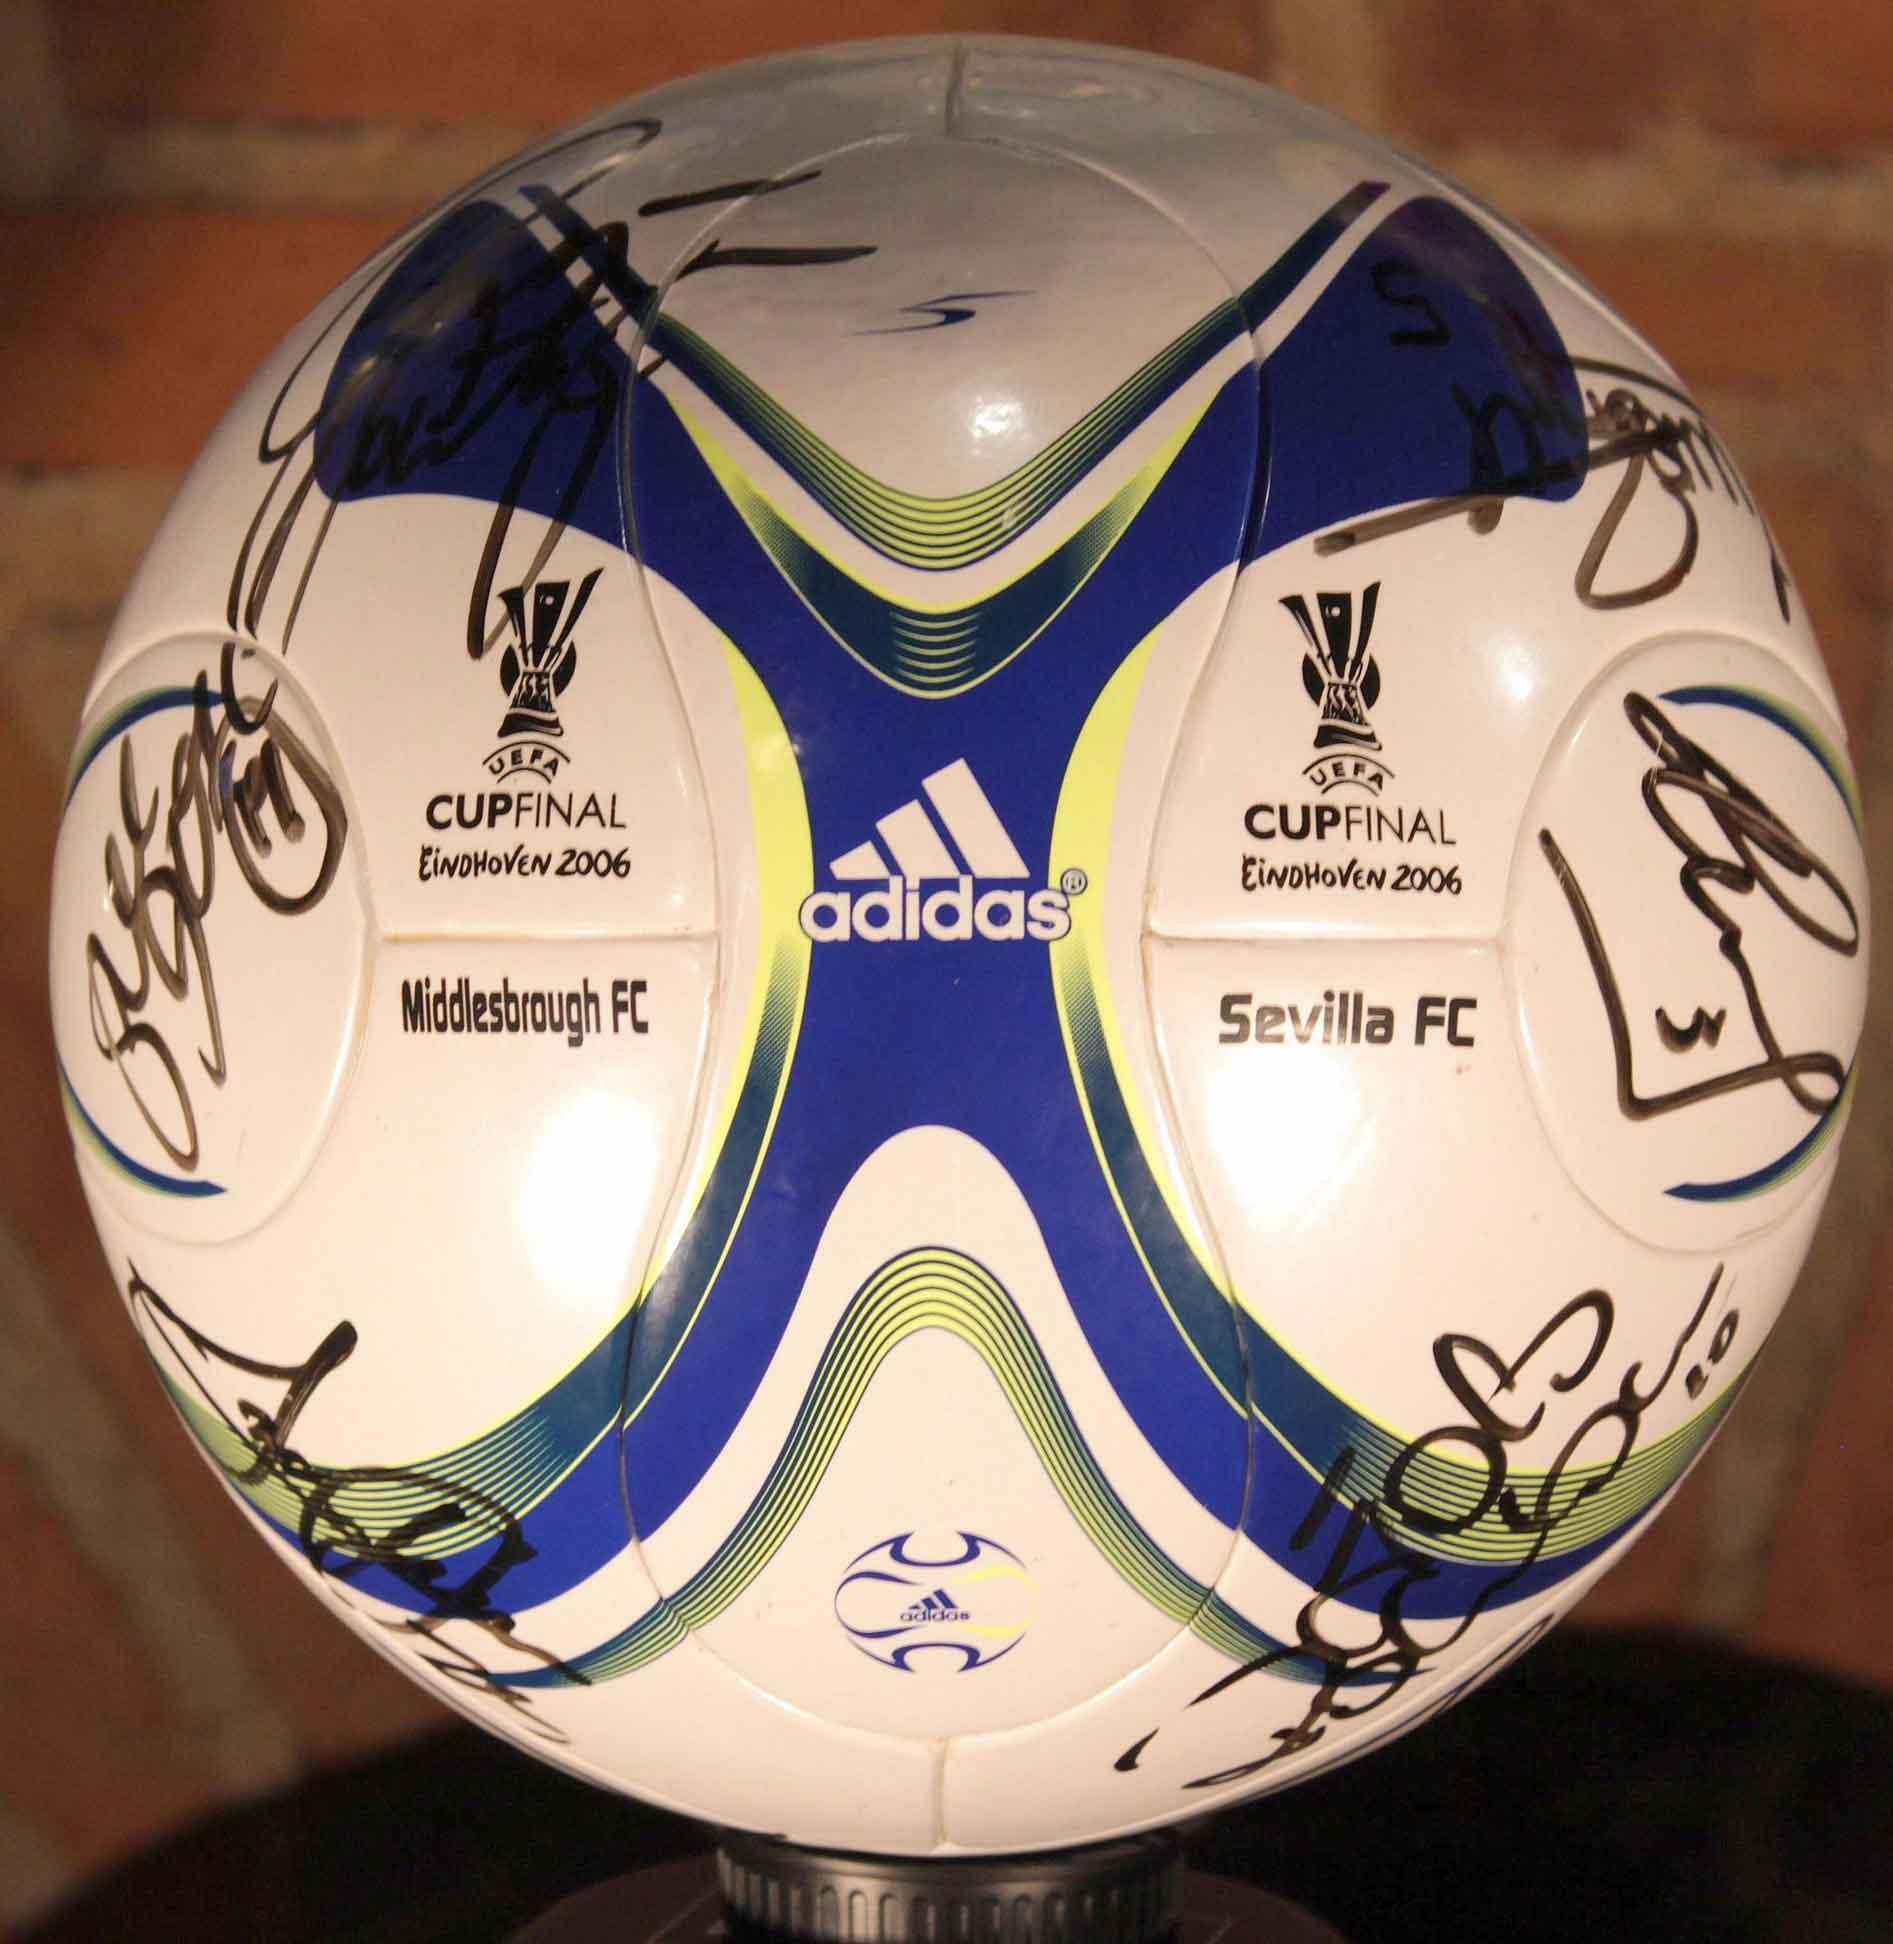 Мячом финала Кубка УЕФА 2006 стал мяч Adidas F50 TUNIT